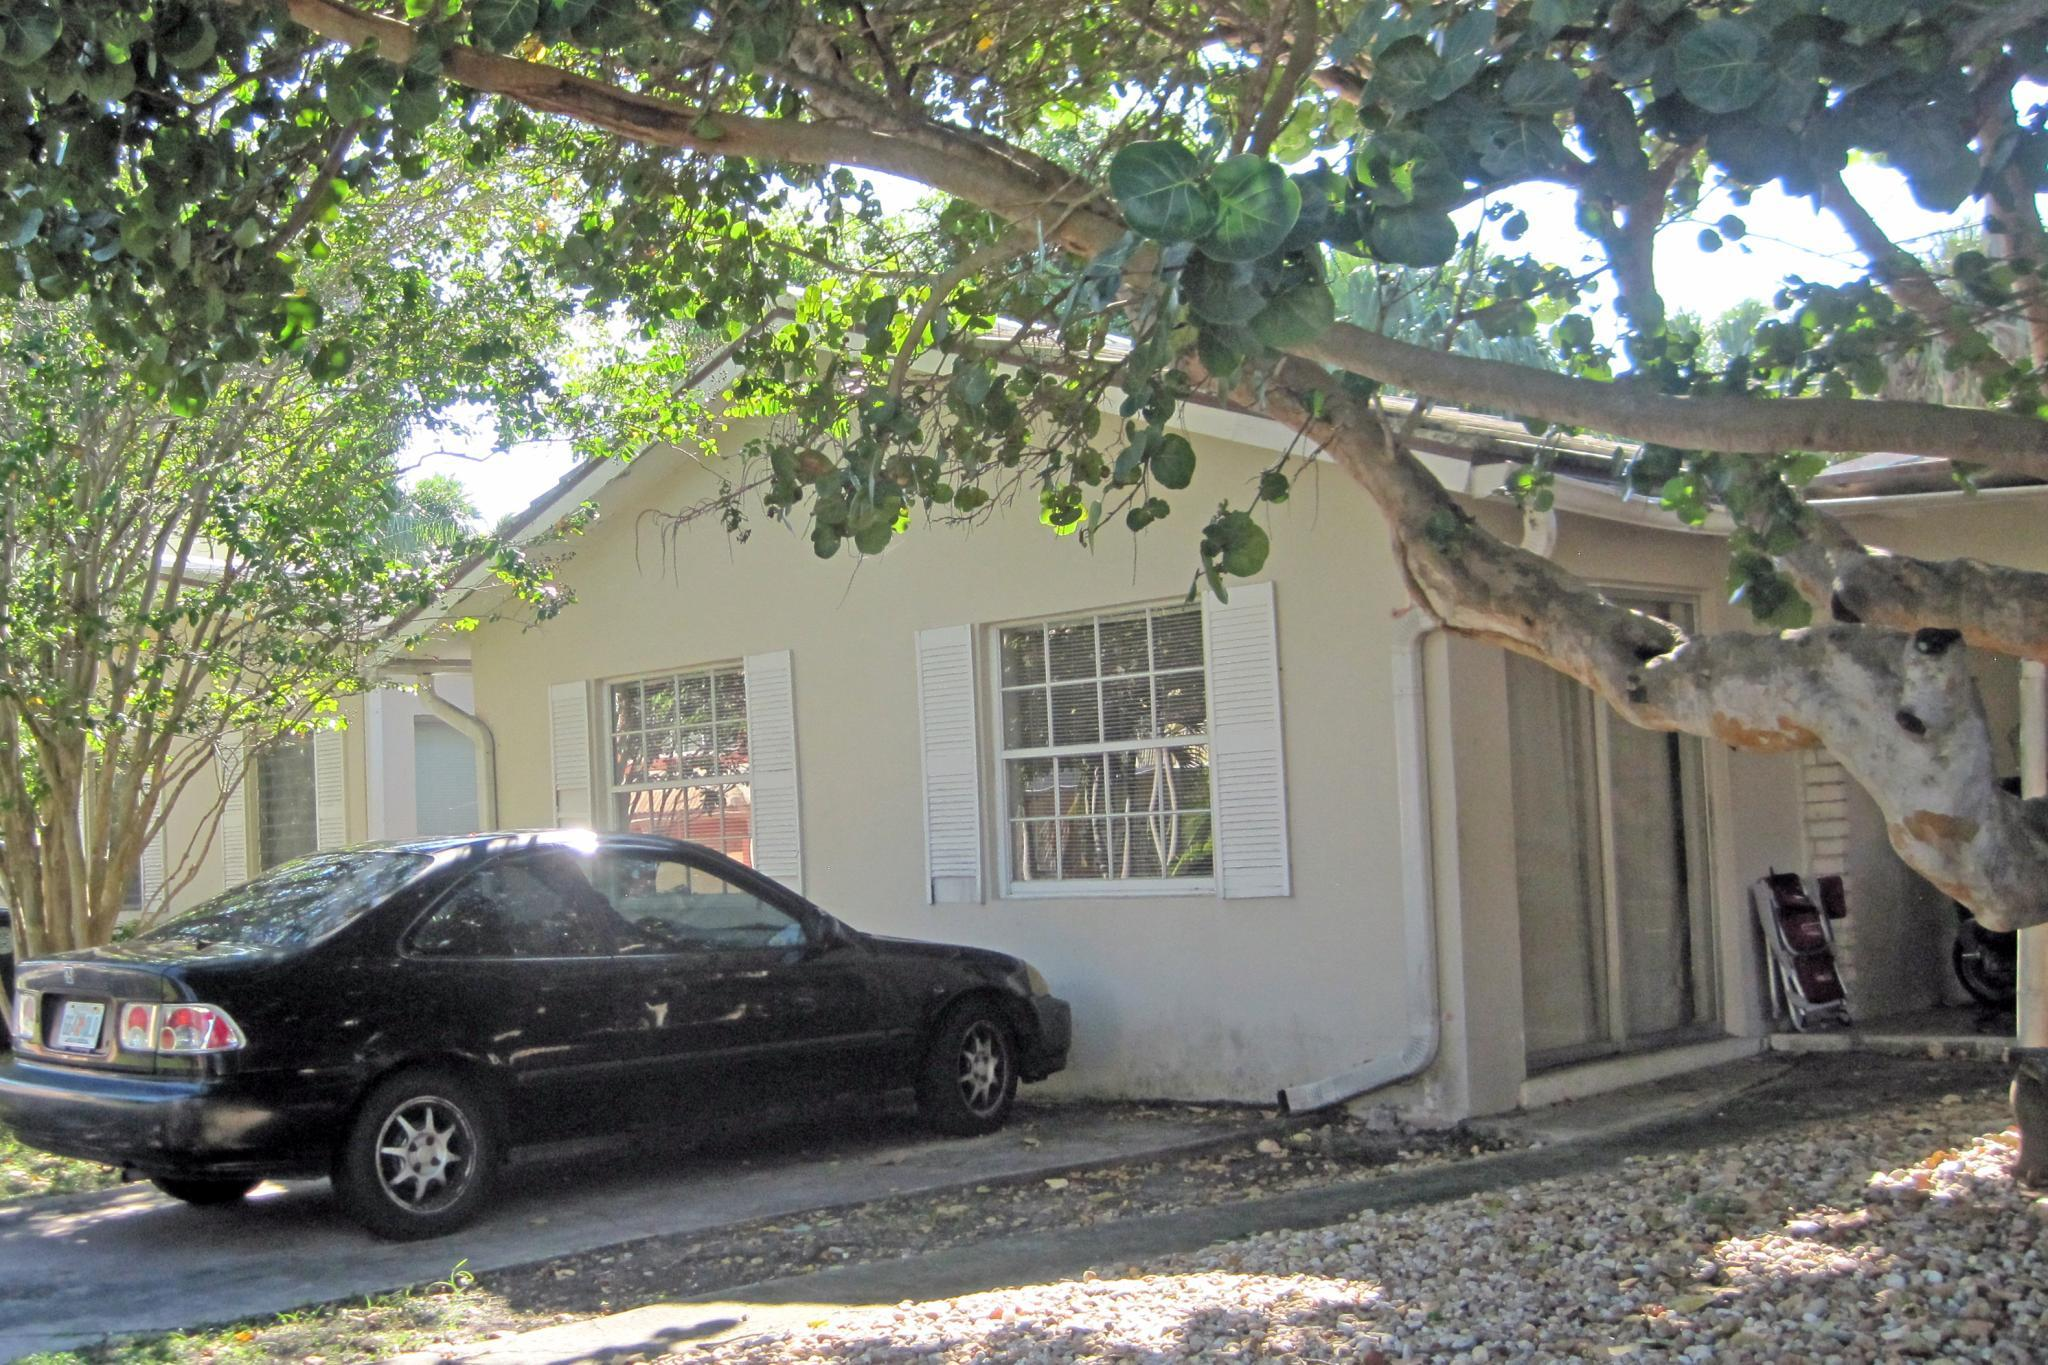 950 Lake Wyman Road, Boca Raton, Florida 33431, ,1 BathroomBathrooms,Duplex/Triplex/Quadplex,For Rent,Lake Wyman,RX-10583520